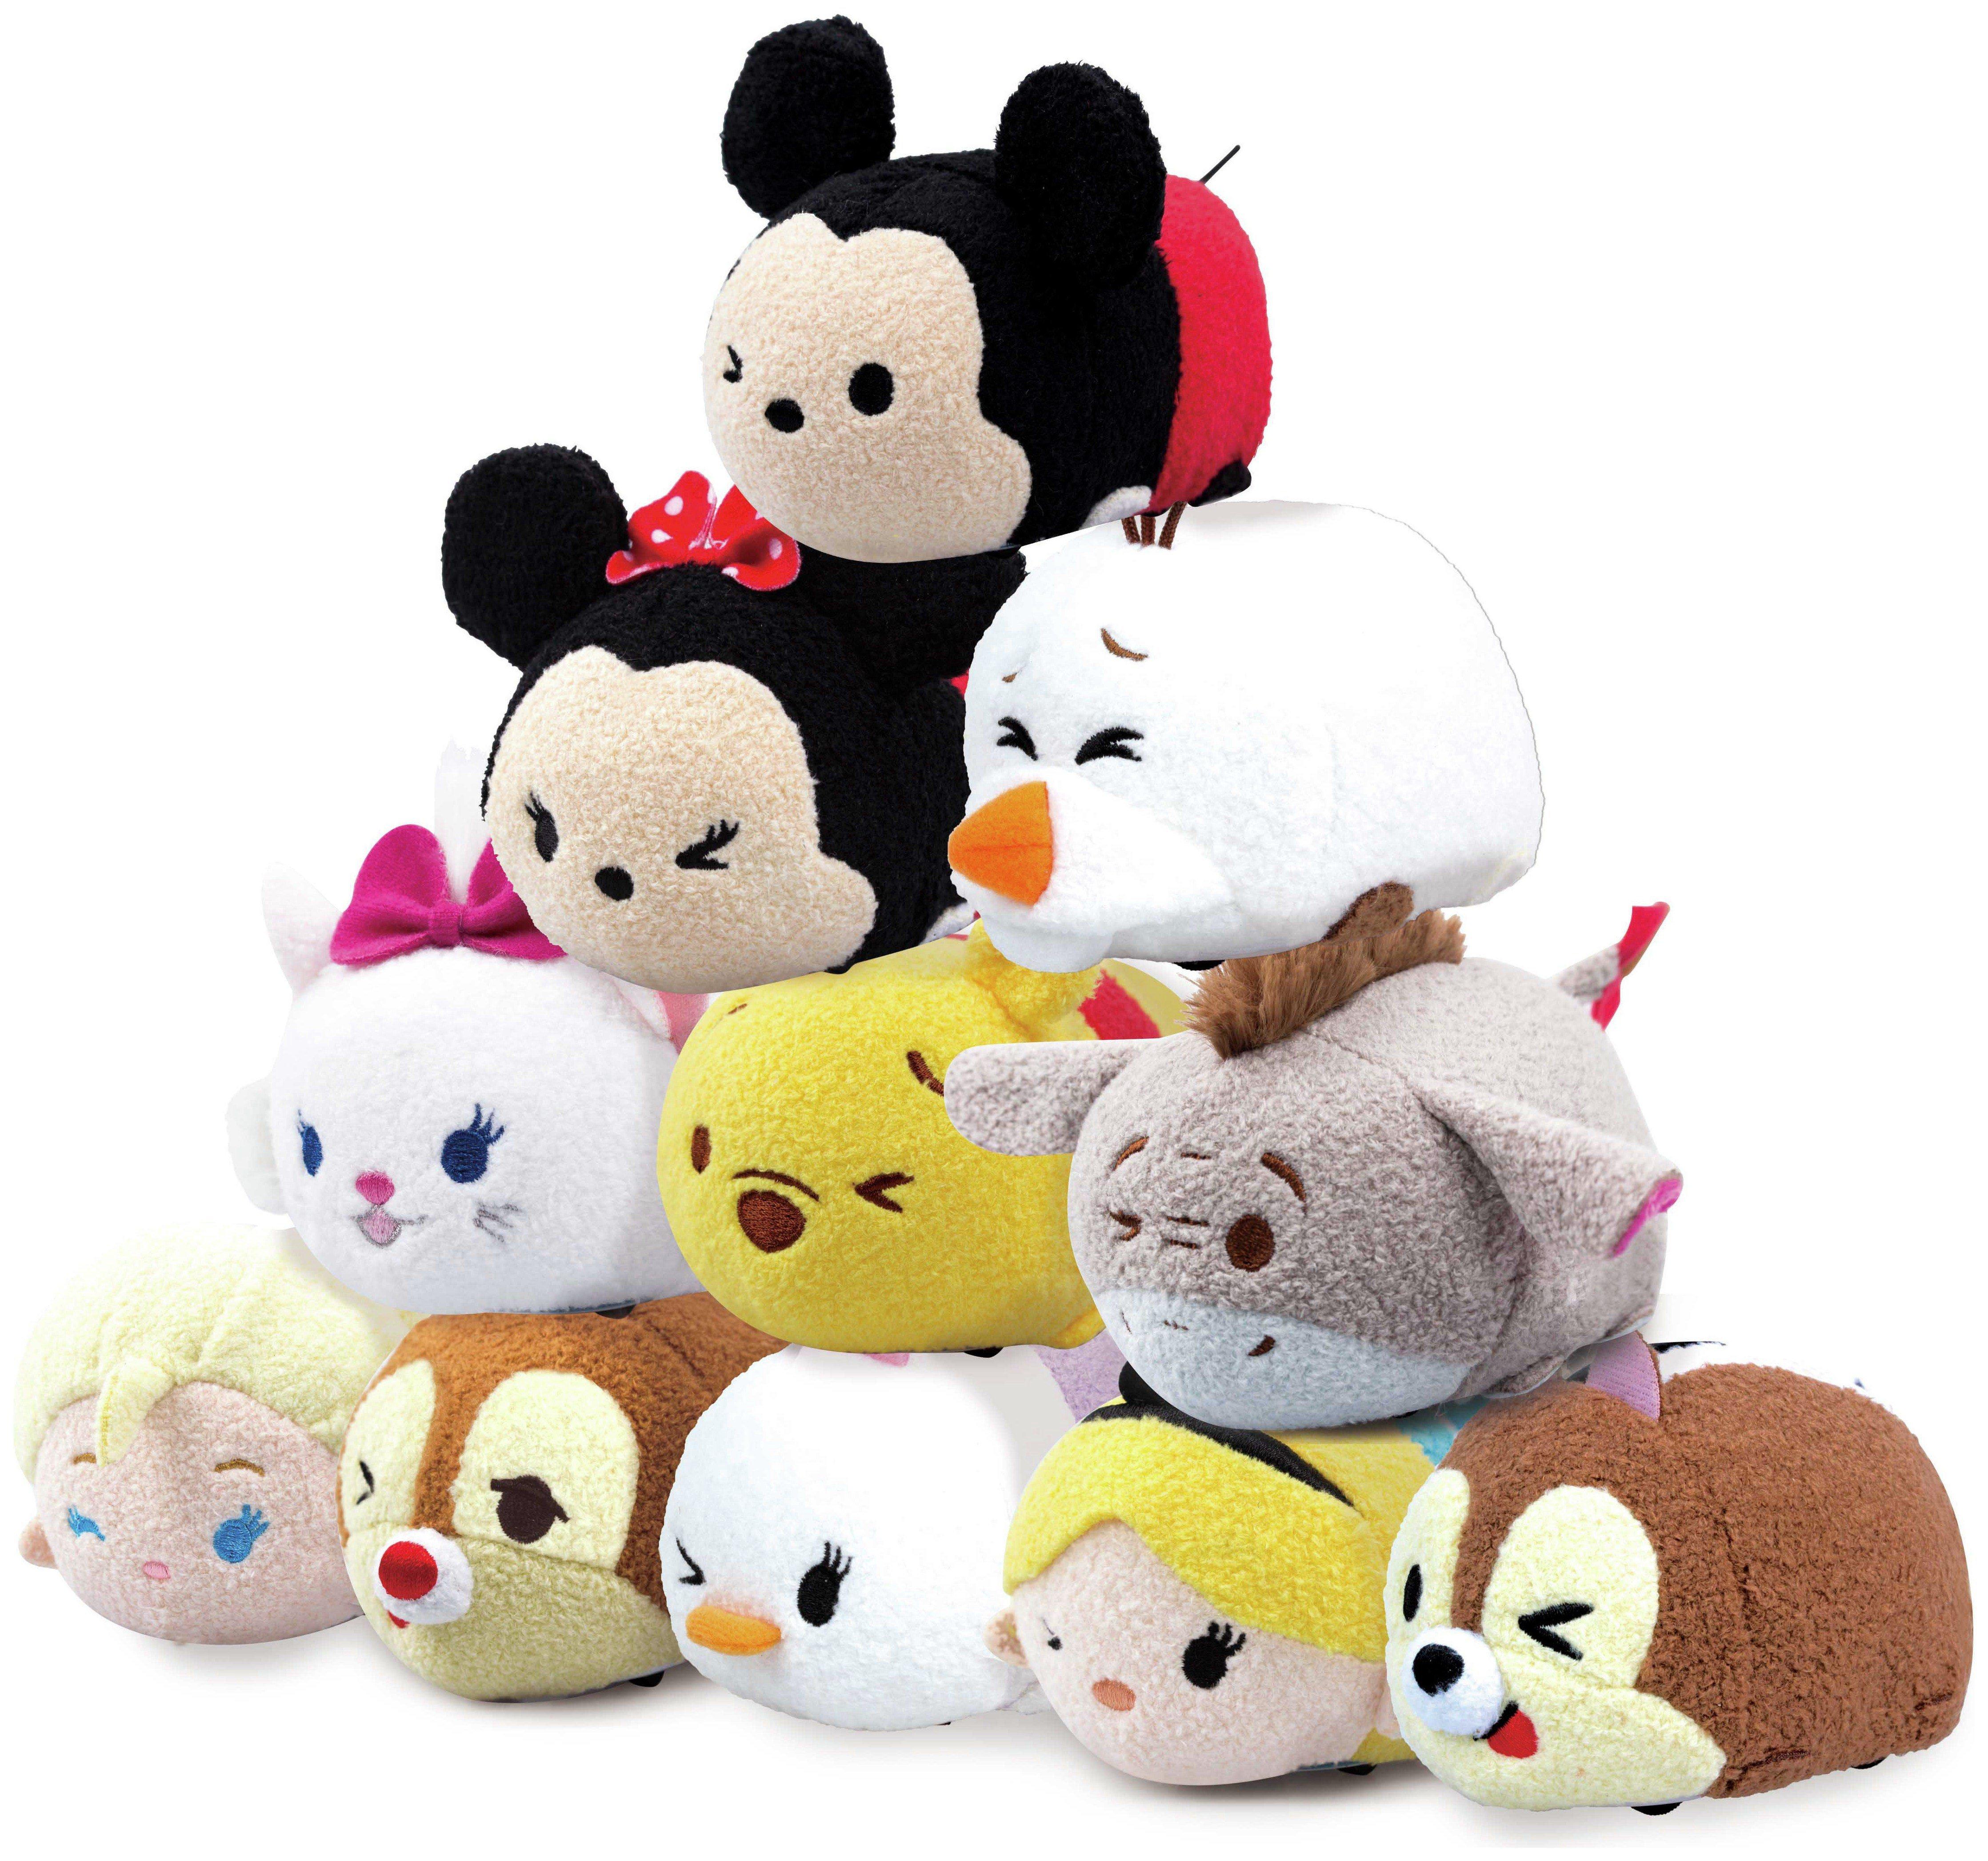 Buy Disney Tsum Tsum Series 1 Zippies Soft Toy